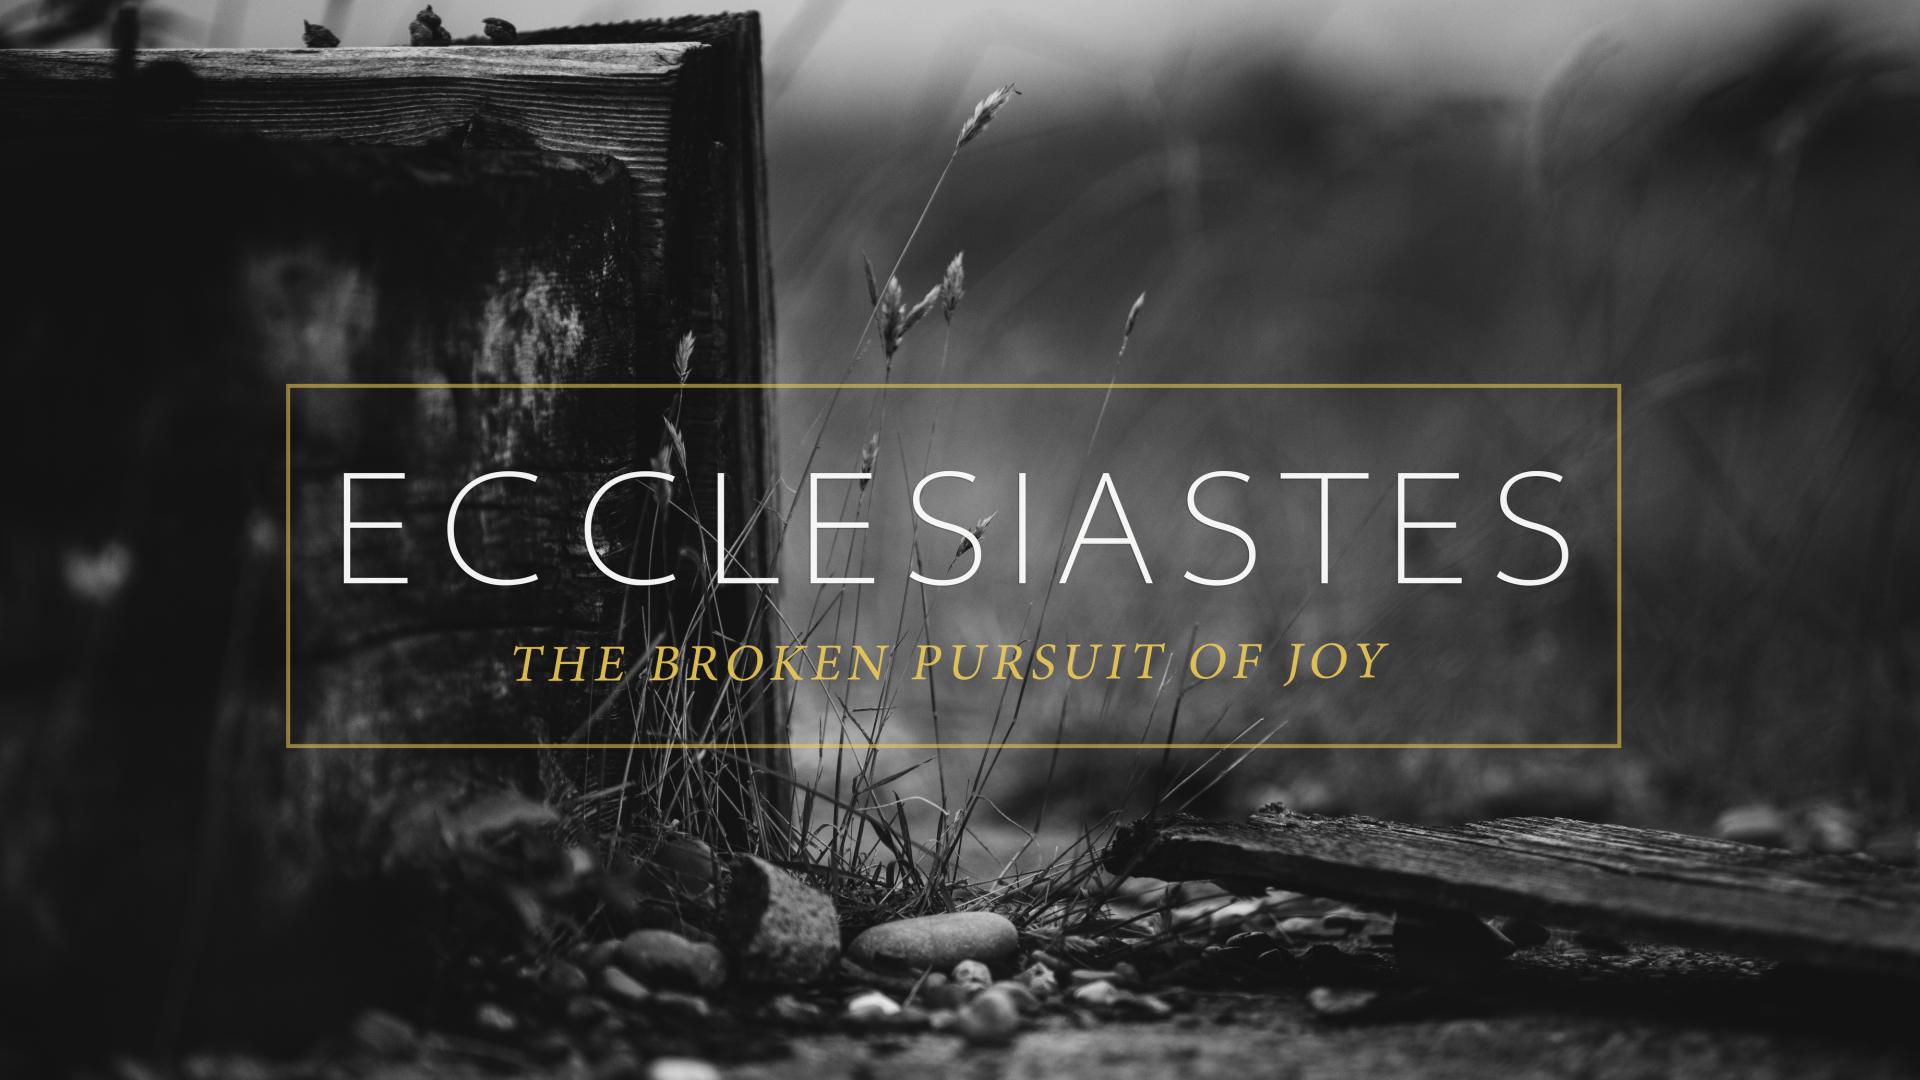 Ecclesiastes: The Broken Pursuit of Joy (2017)